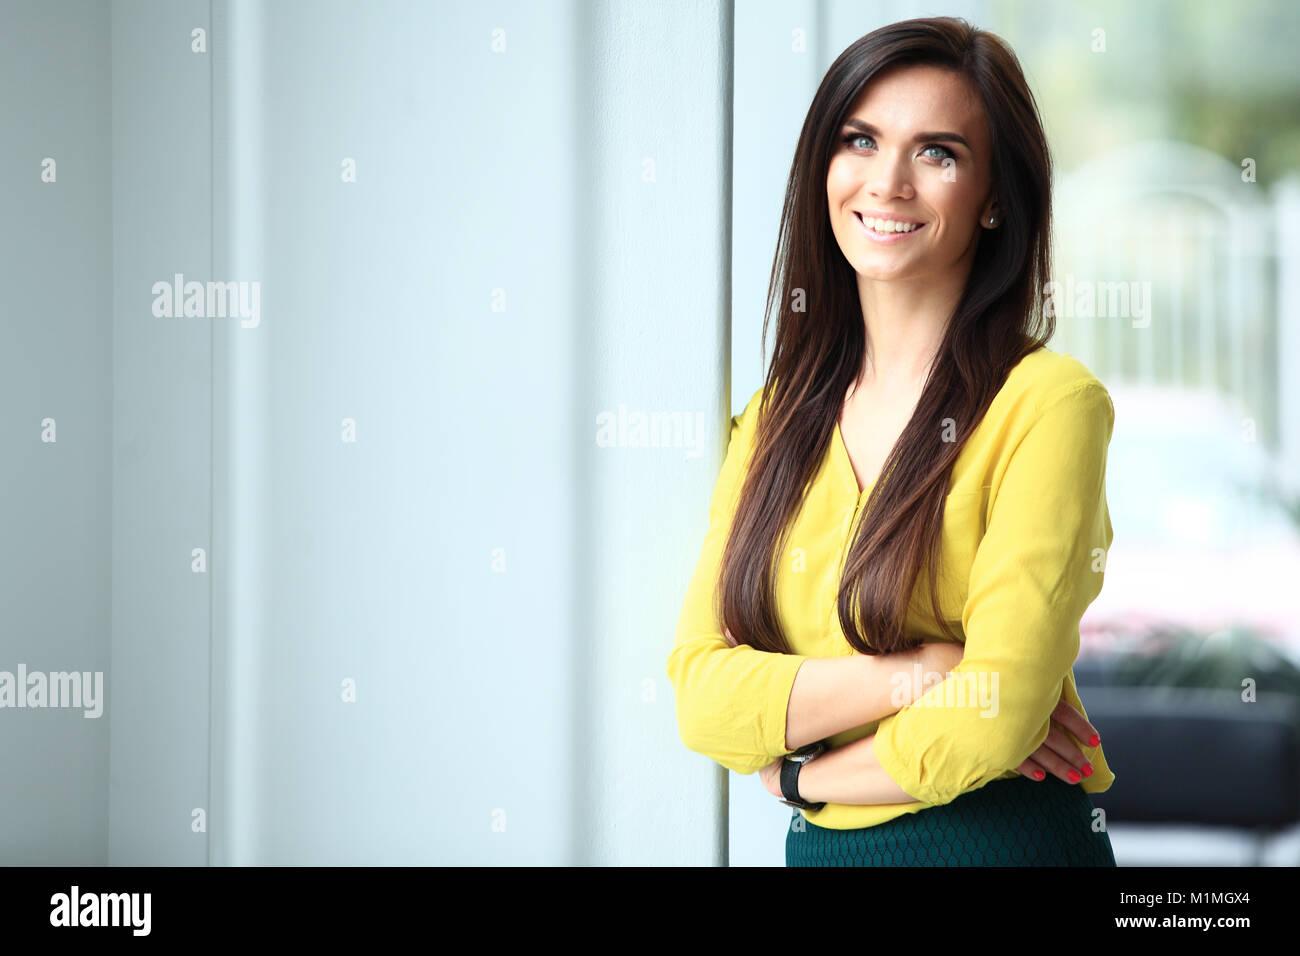 Moderne Business Frau Im Büro Mit Textfreiraum Stockfoto Bild